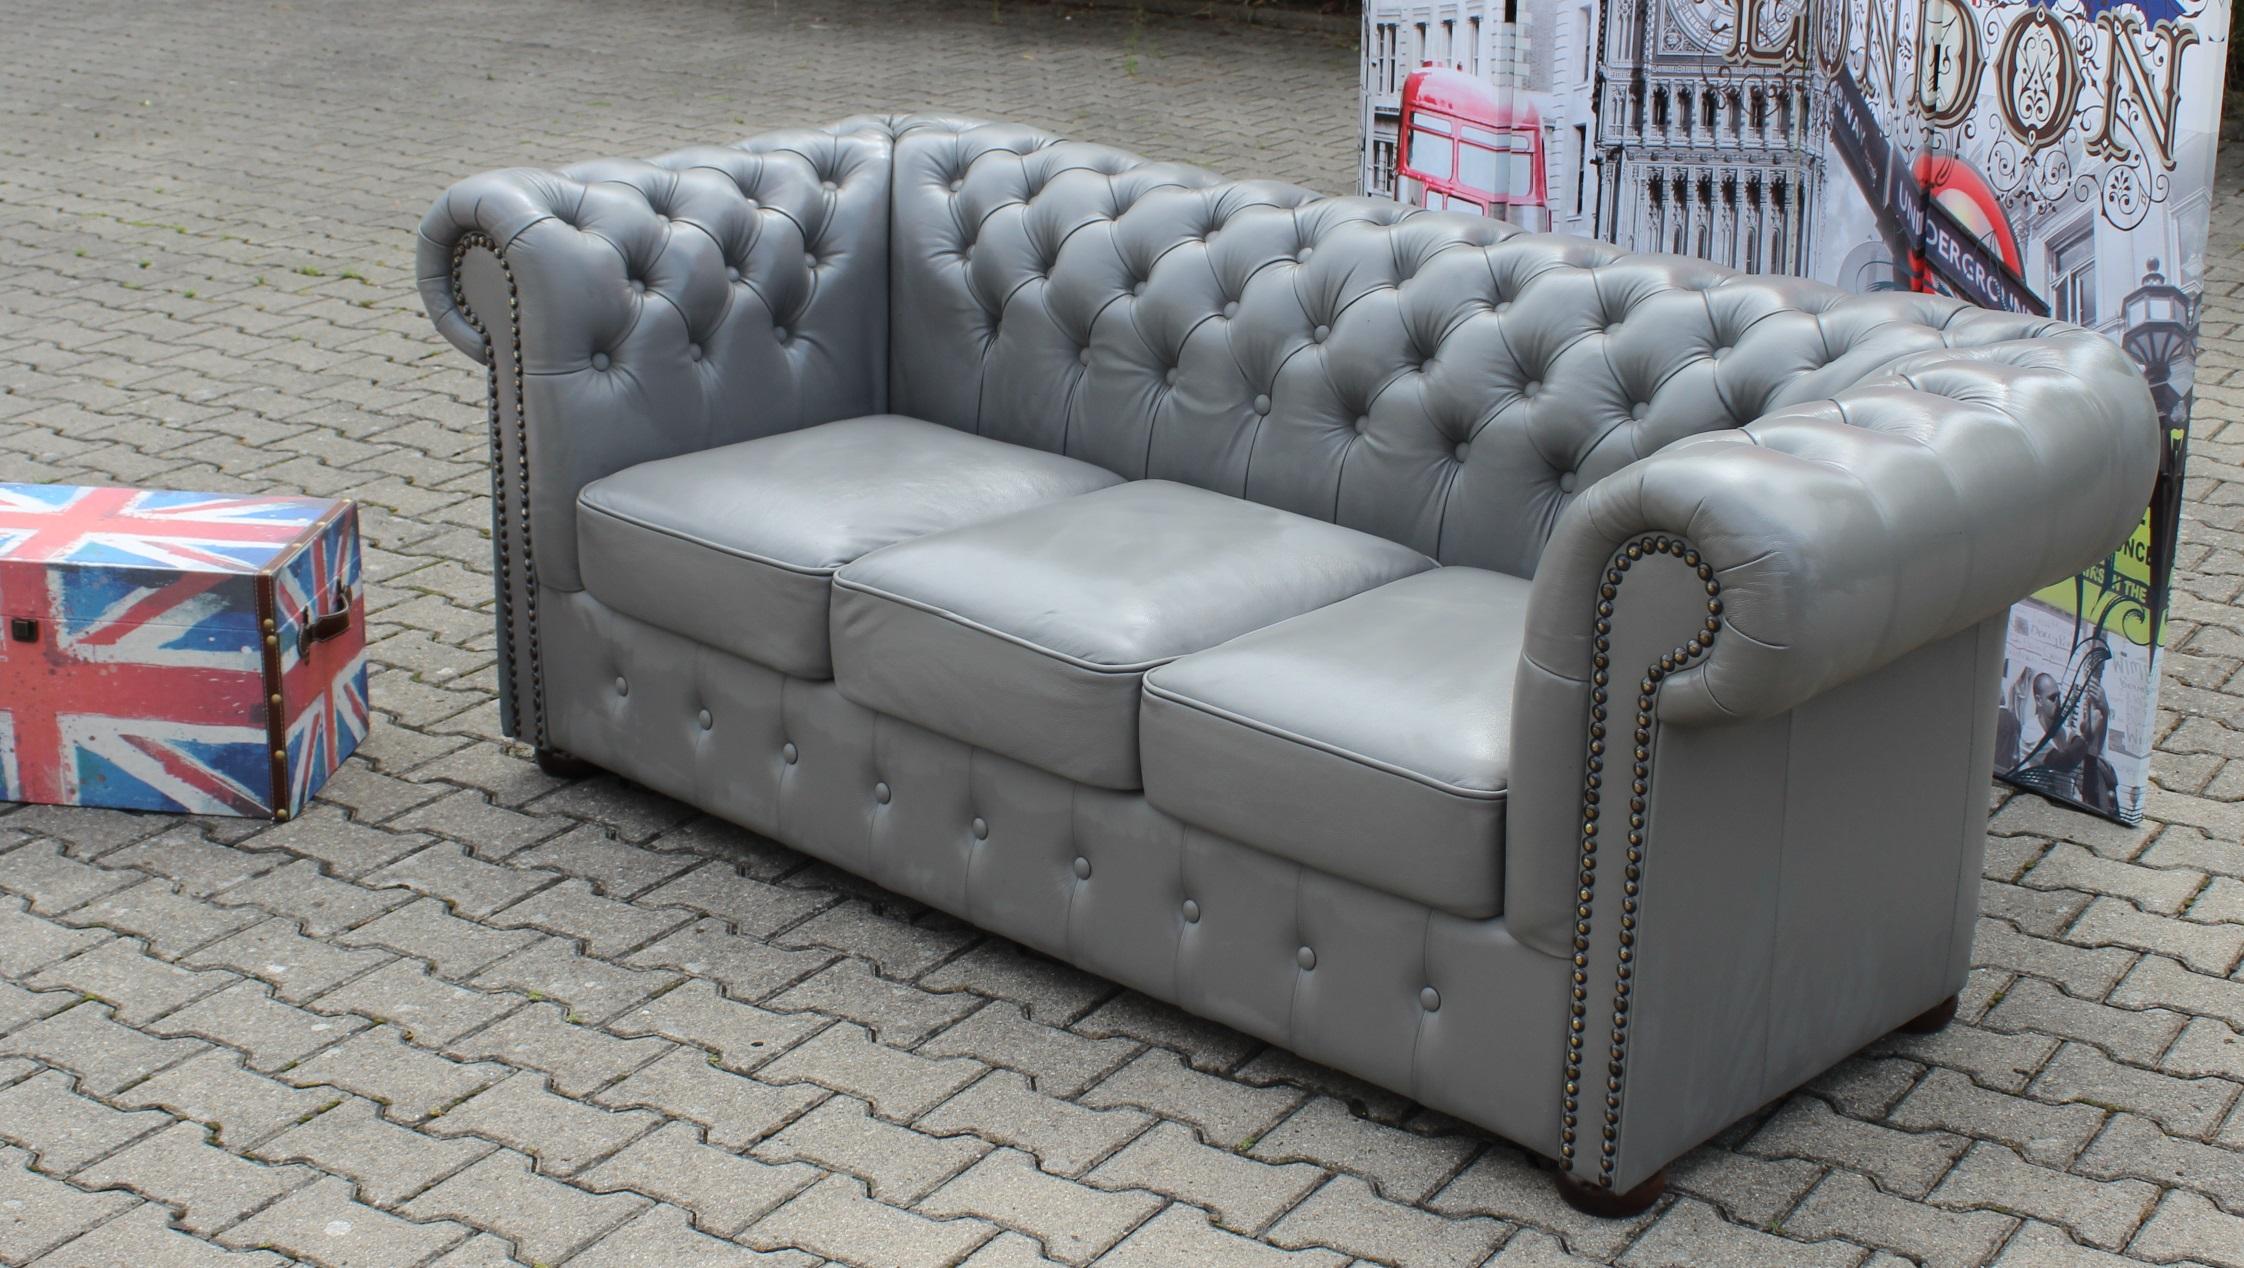 chesterfield sofa napoli designer couchgarnitur sofort lieferbar ledersofa neu ebay